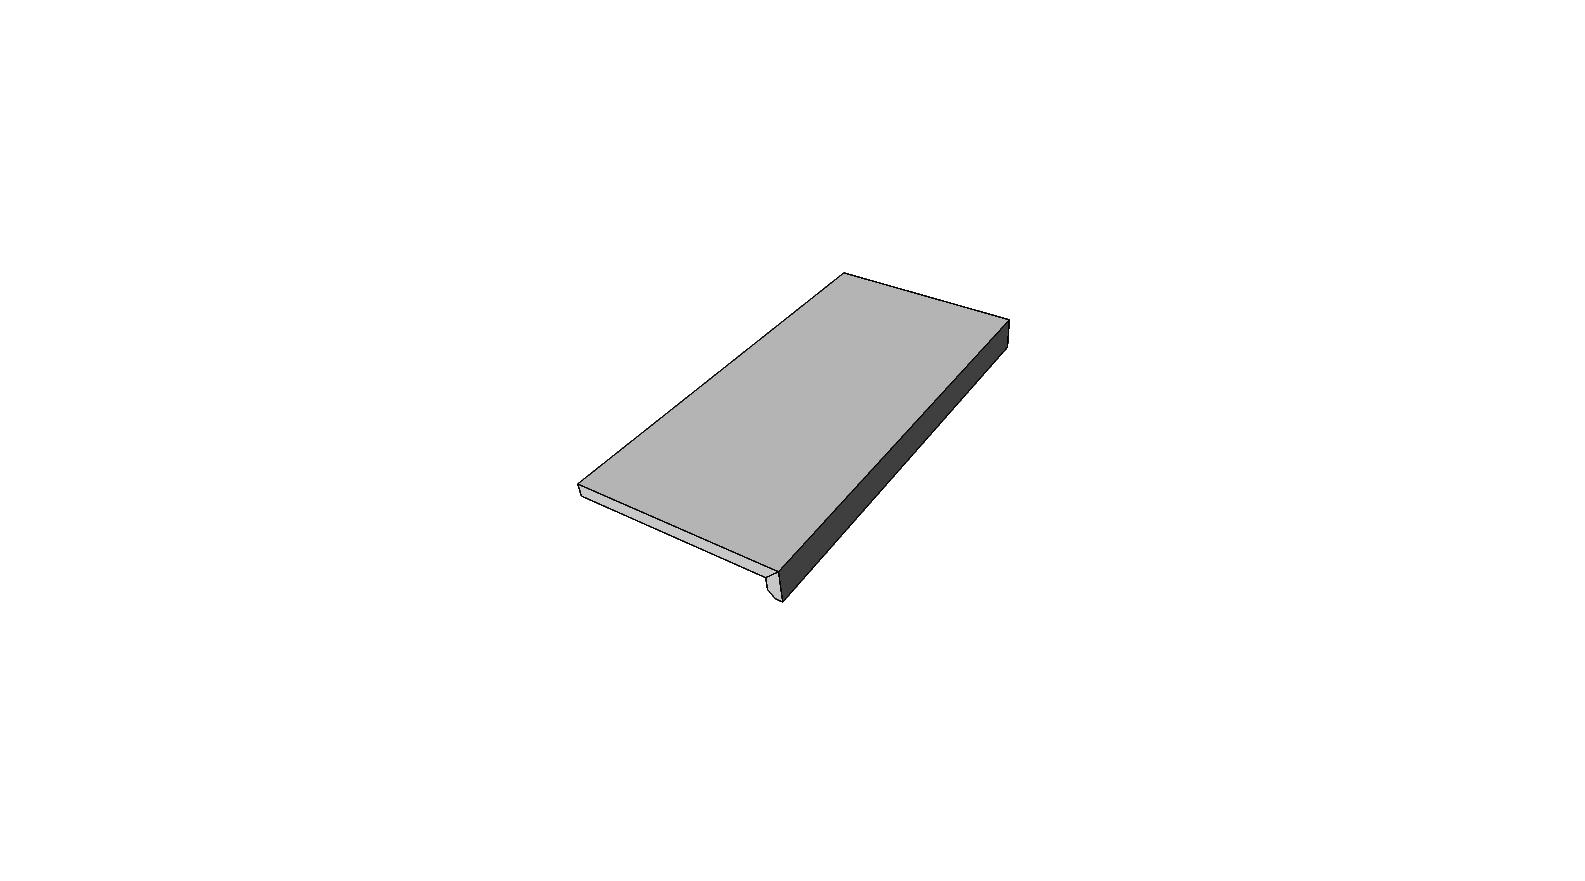 "Bordo a L incollato <span style=""white-space:nowrap;"">30x60 cm</span>  <span style=""white-space:nowrap;"">sp. 20mm</span>"